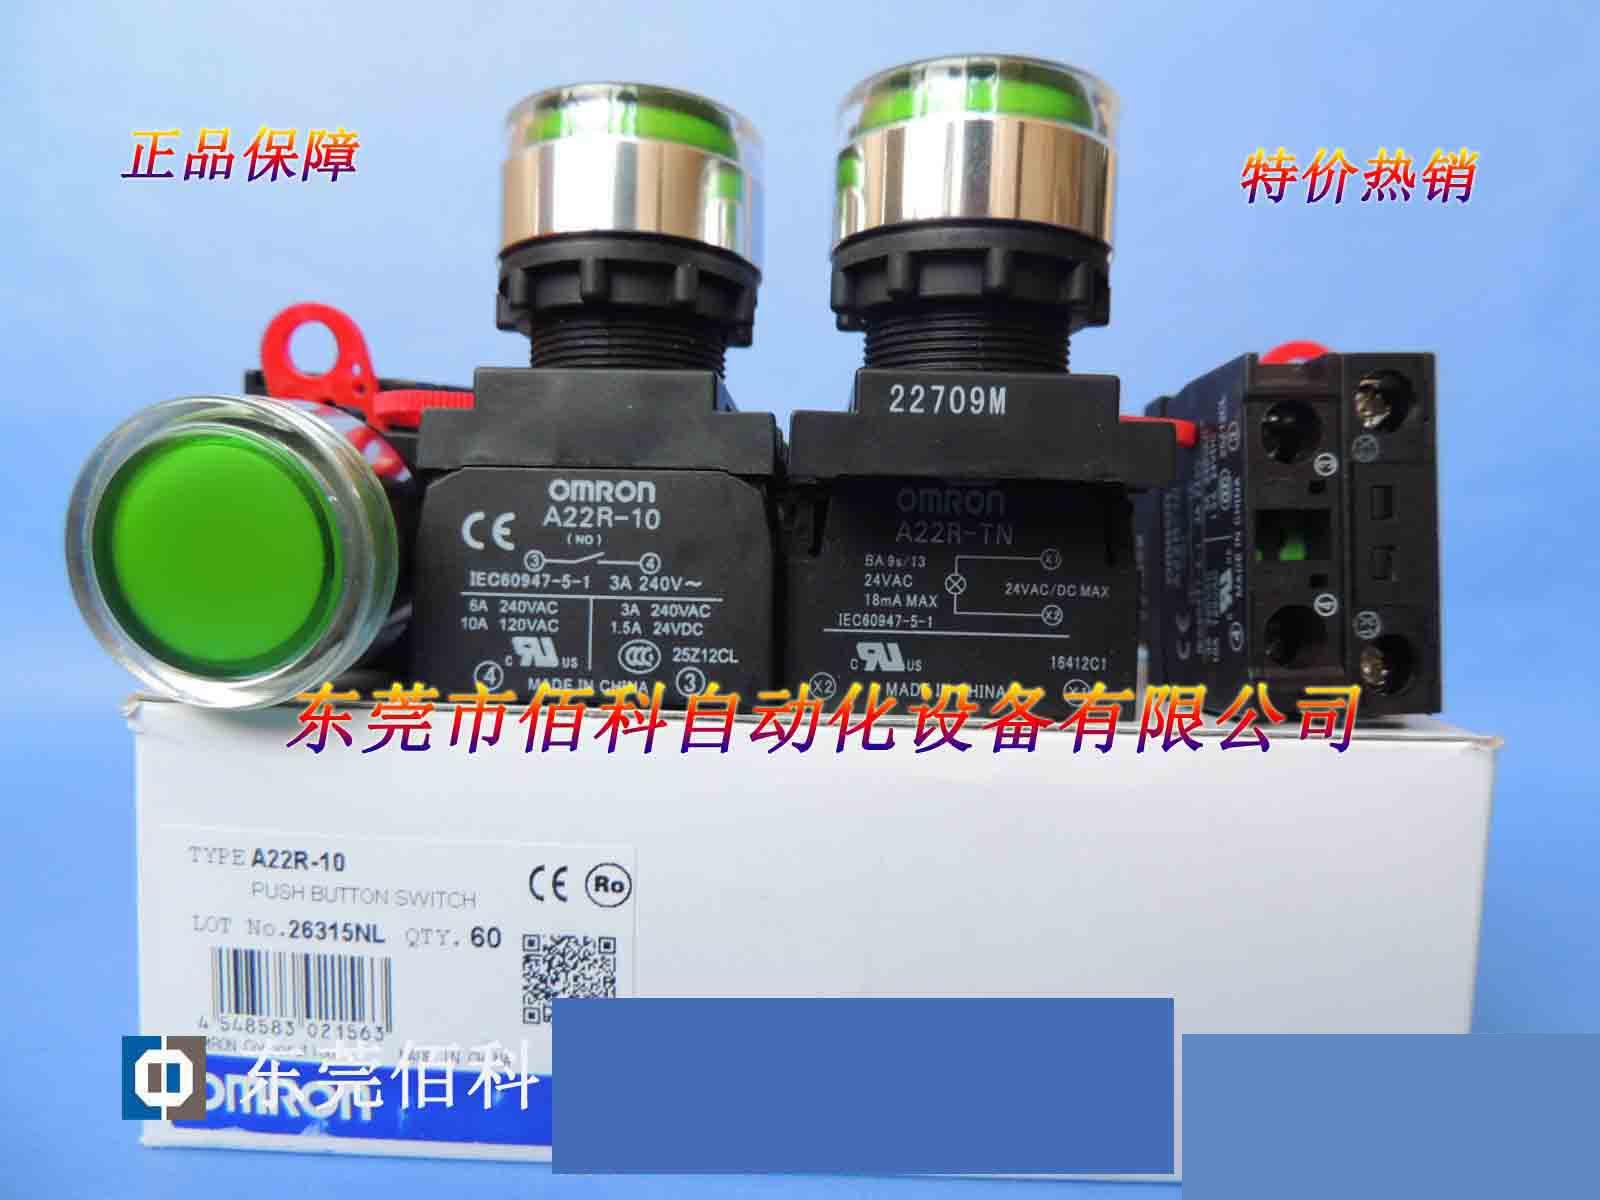 New Original Genuine OMRON Button Switch A22RL-FG-24A-10MNew Original Genuine OMRON Button Switch A22RL-FG-24A-10M